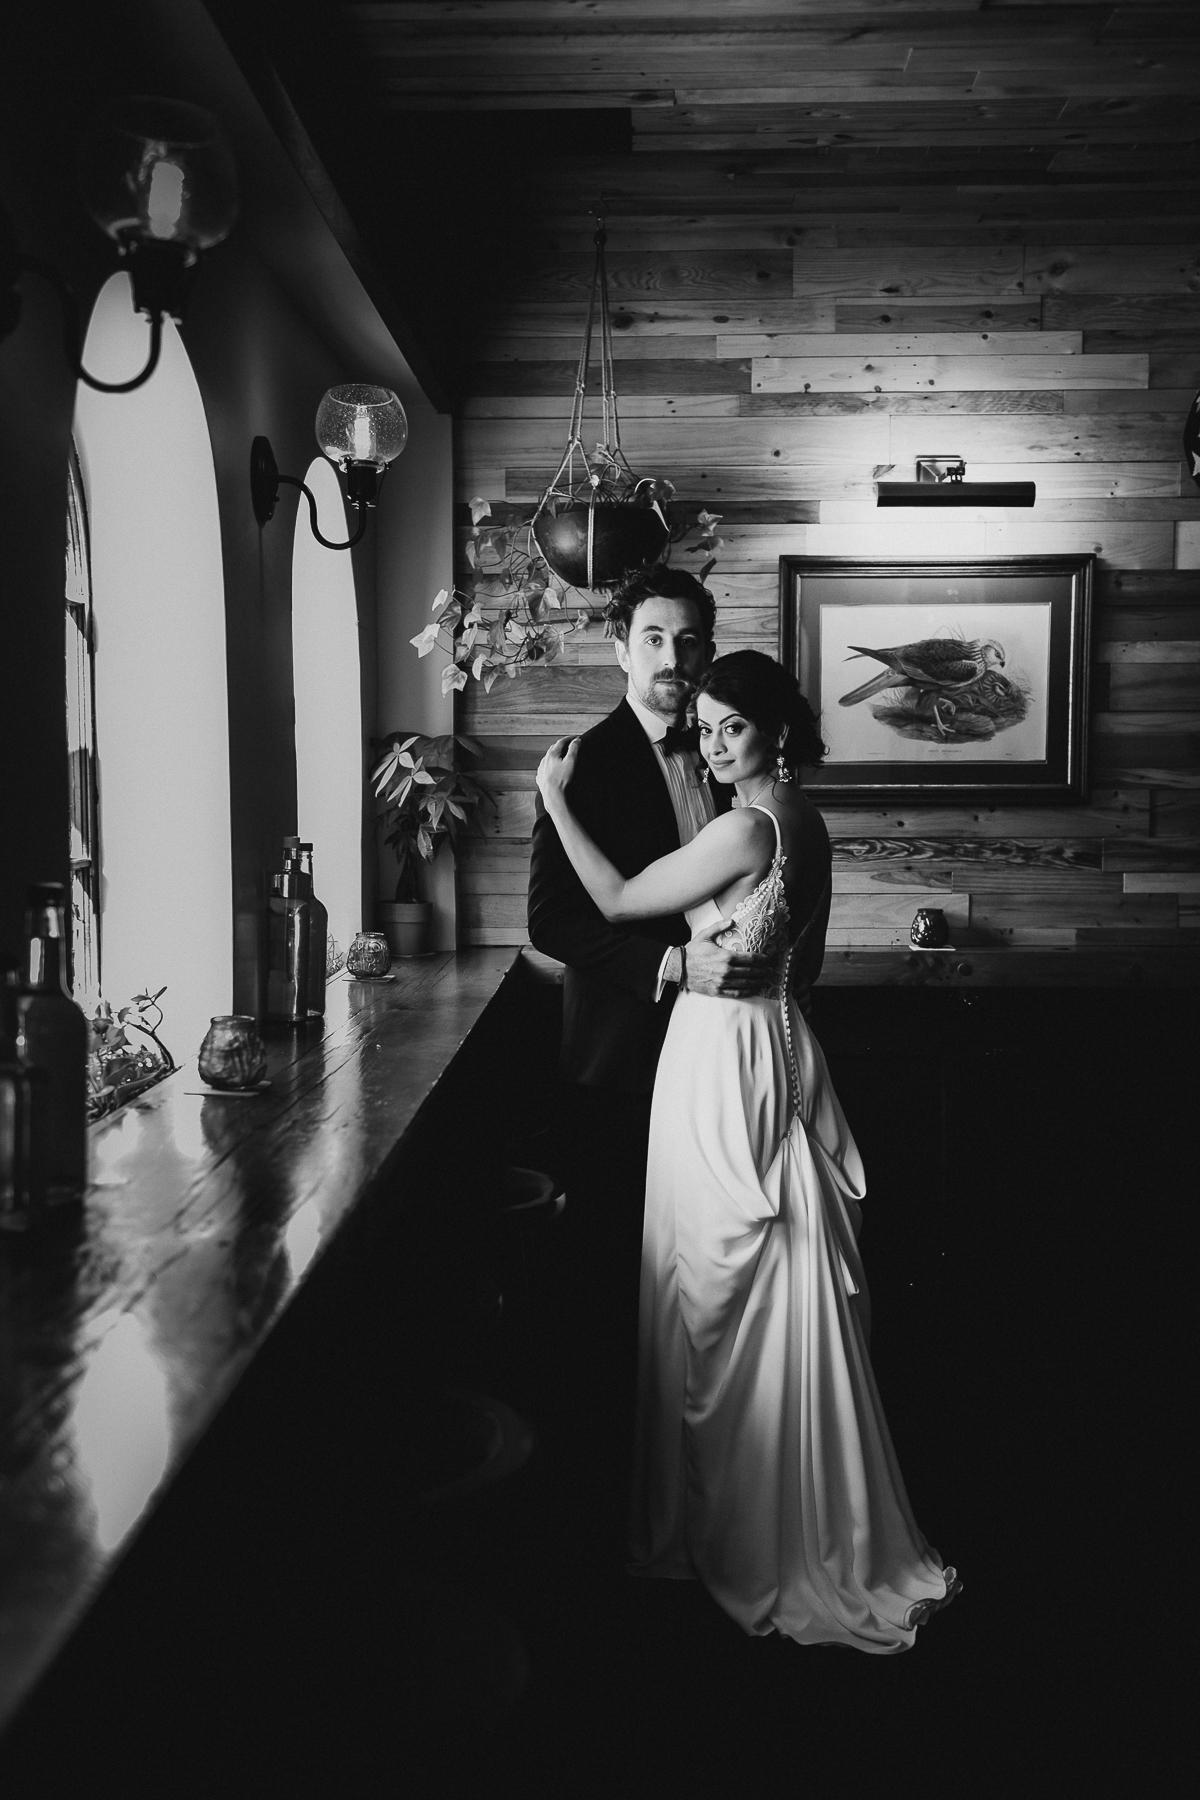 Humboldt-&-Jackson-Restaurant-Intimate-Brooklyn-Documentary-Wedding-Photographer-48.jpg